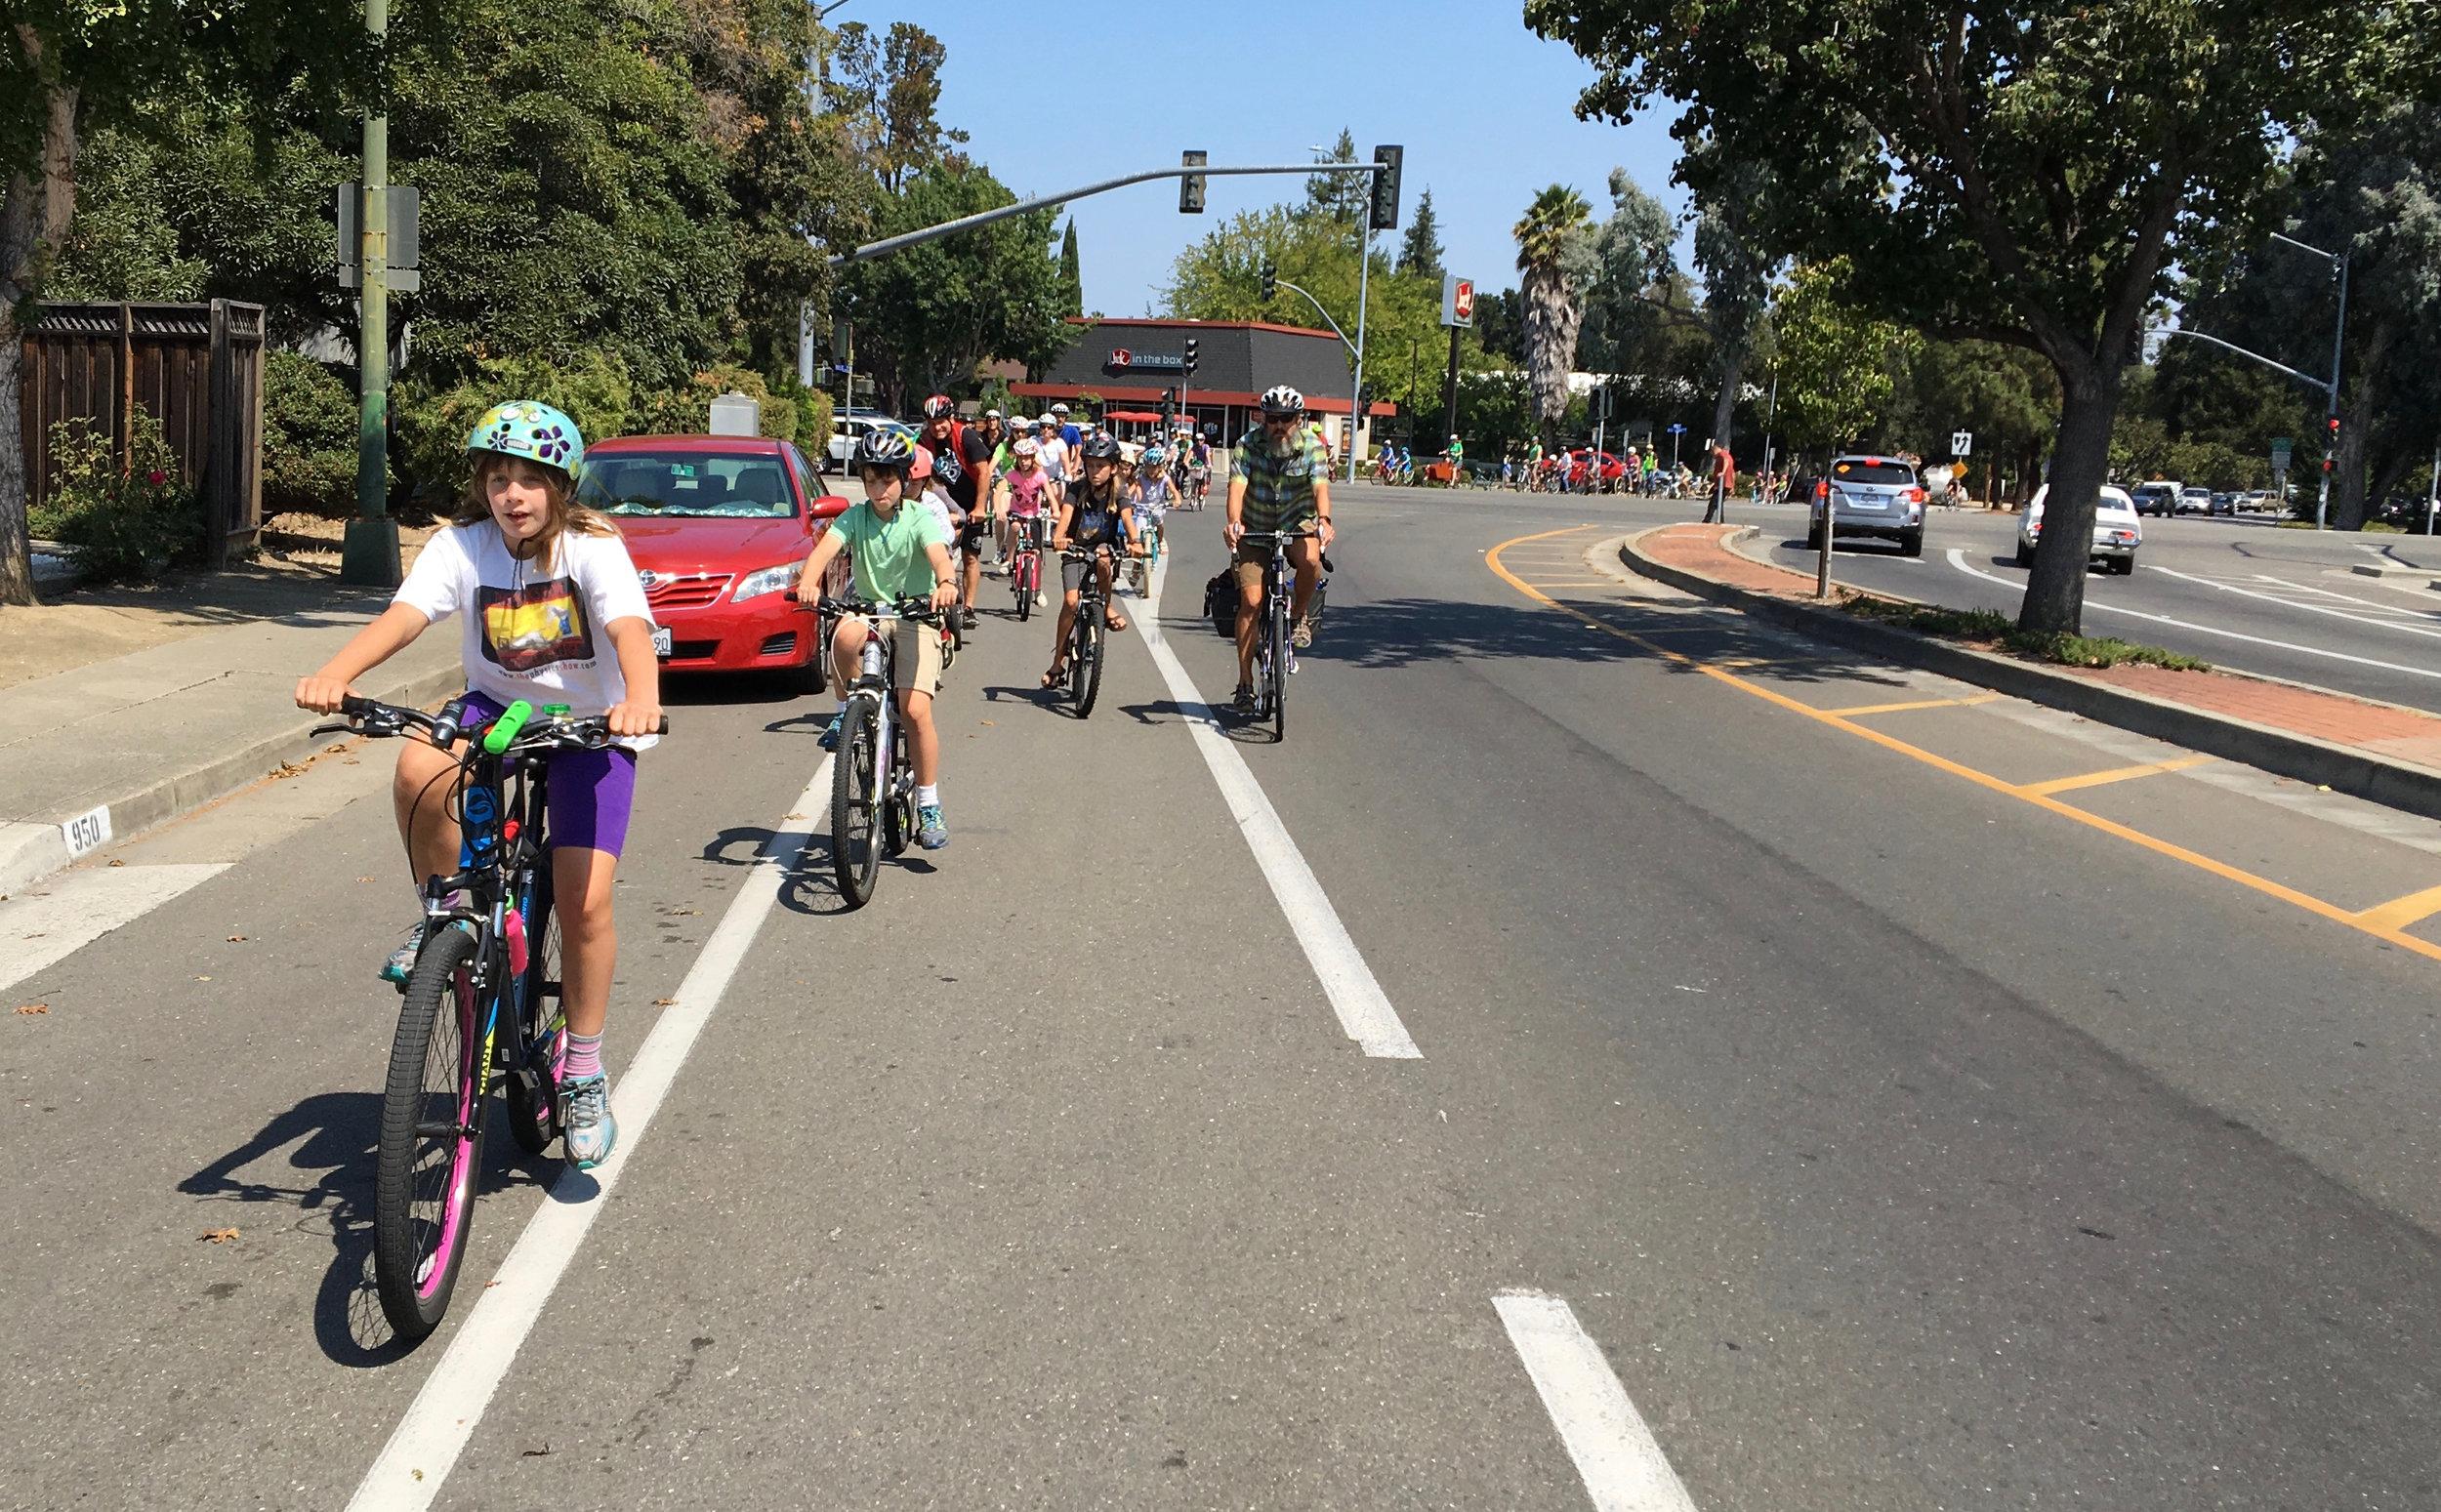 Group Ride across El Camino Real - Photo by John Scarboro